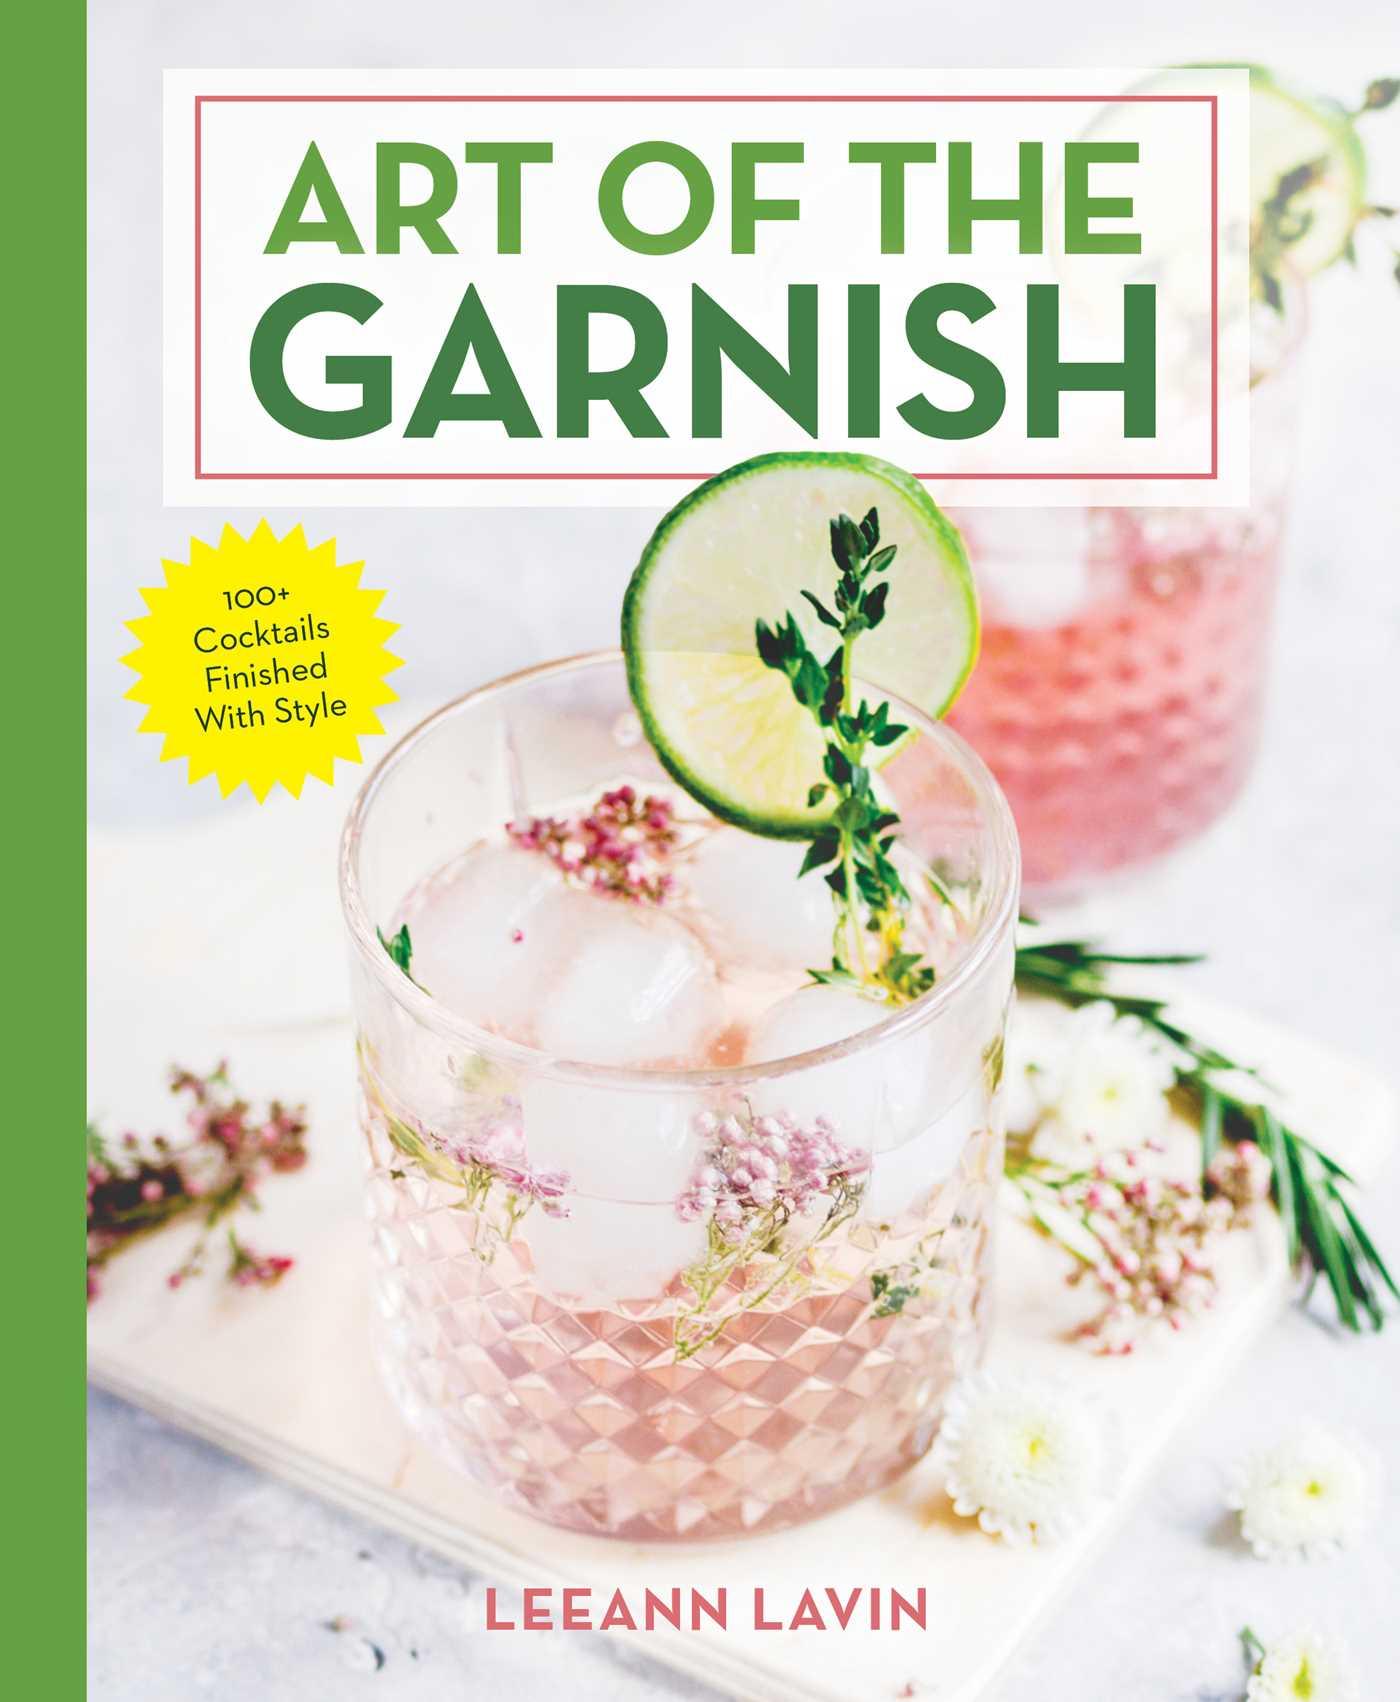 The art of the garnish 9781604336696 hr